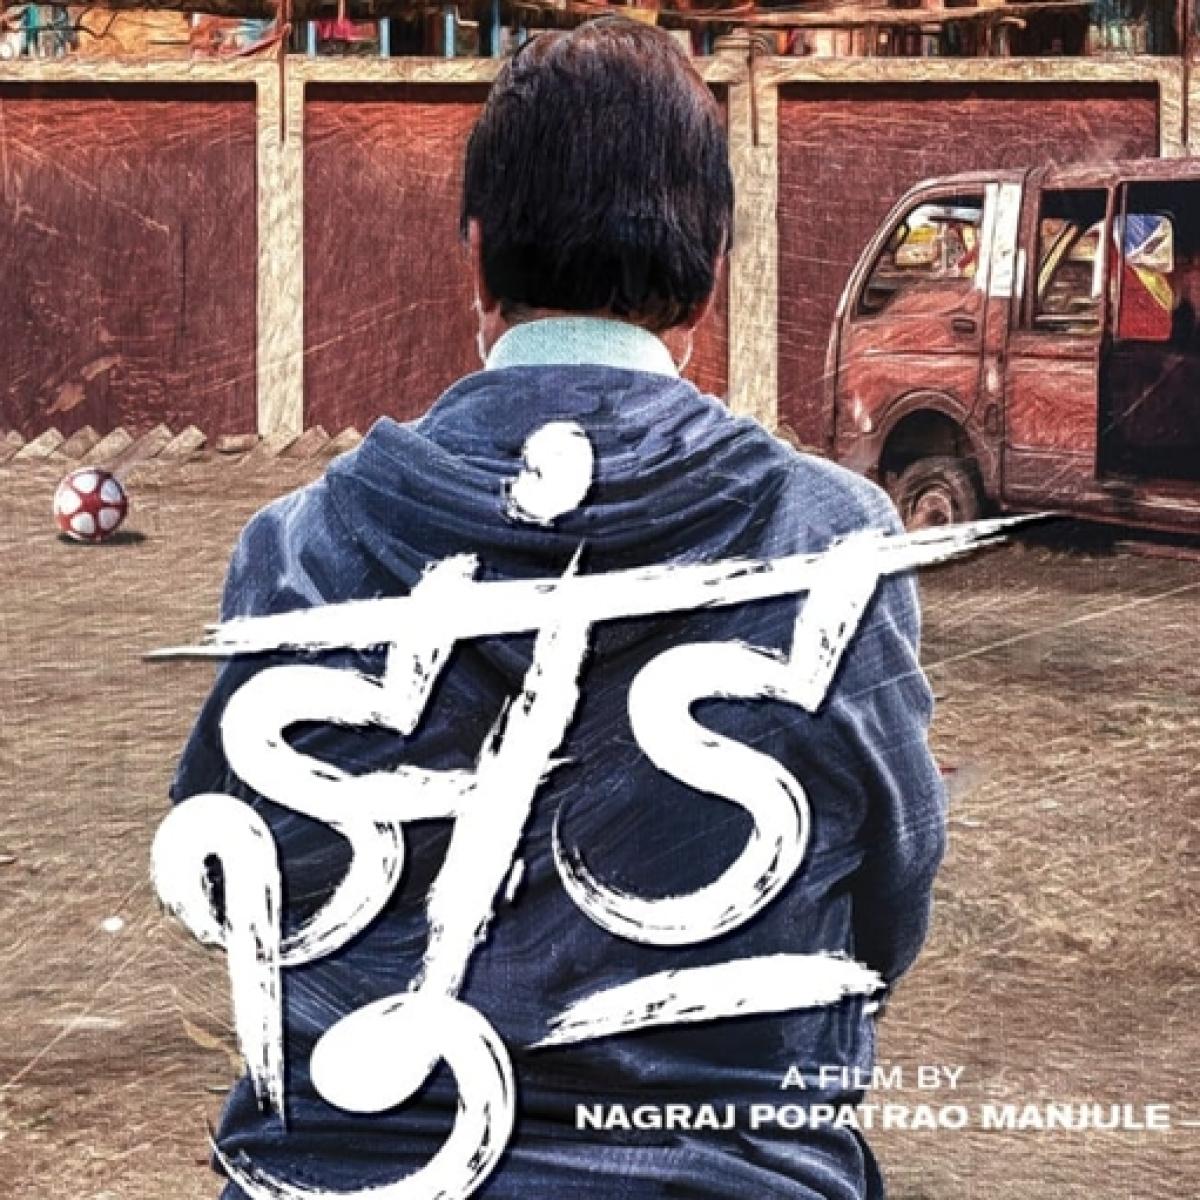 Amitabh Bachchan unveils first poster of Nagraj Manjule directorial 'Jhund'